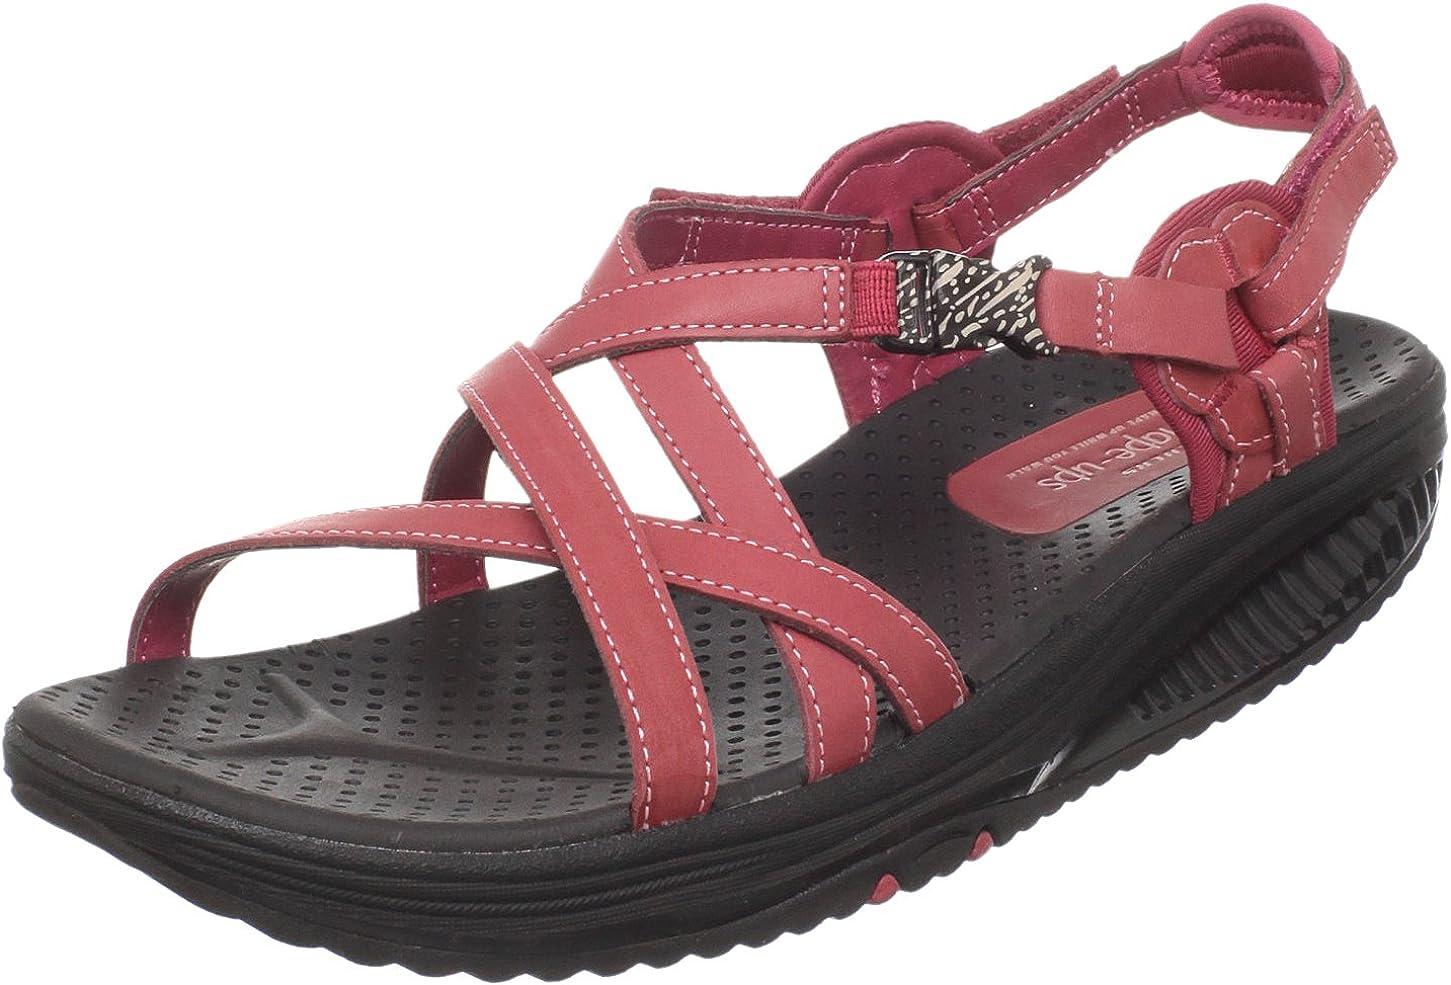 Skechers Women's Shape-ups Point Ranking TOP10 Jamaica Sandal List price Five